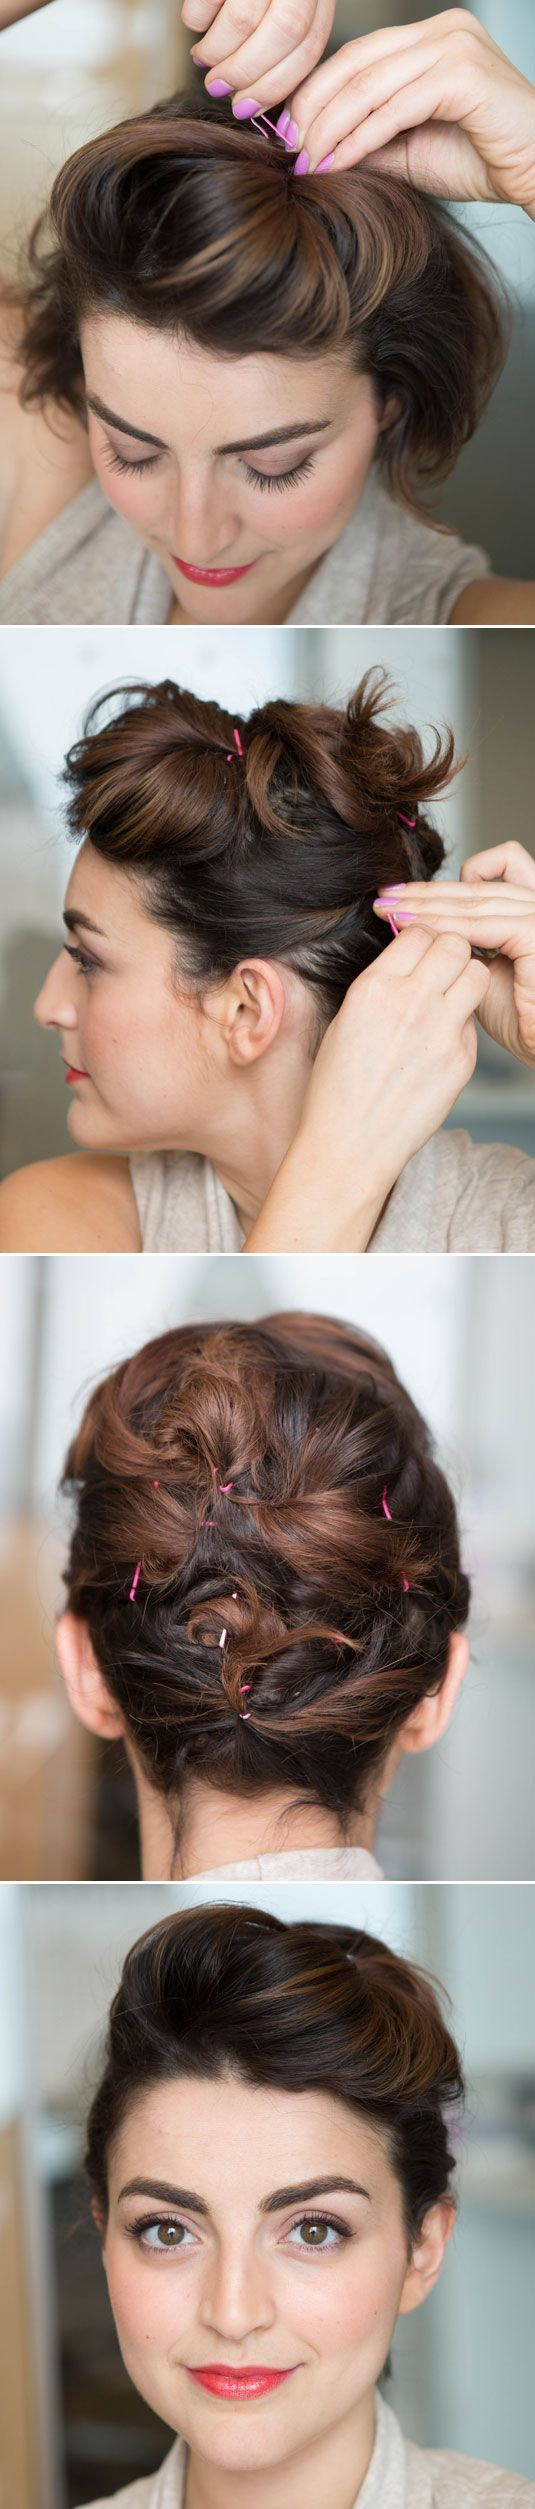 idee de coiffure originale pour cheveux courts #tuto